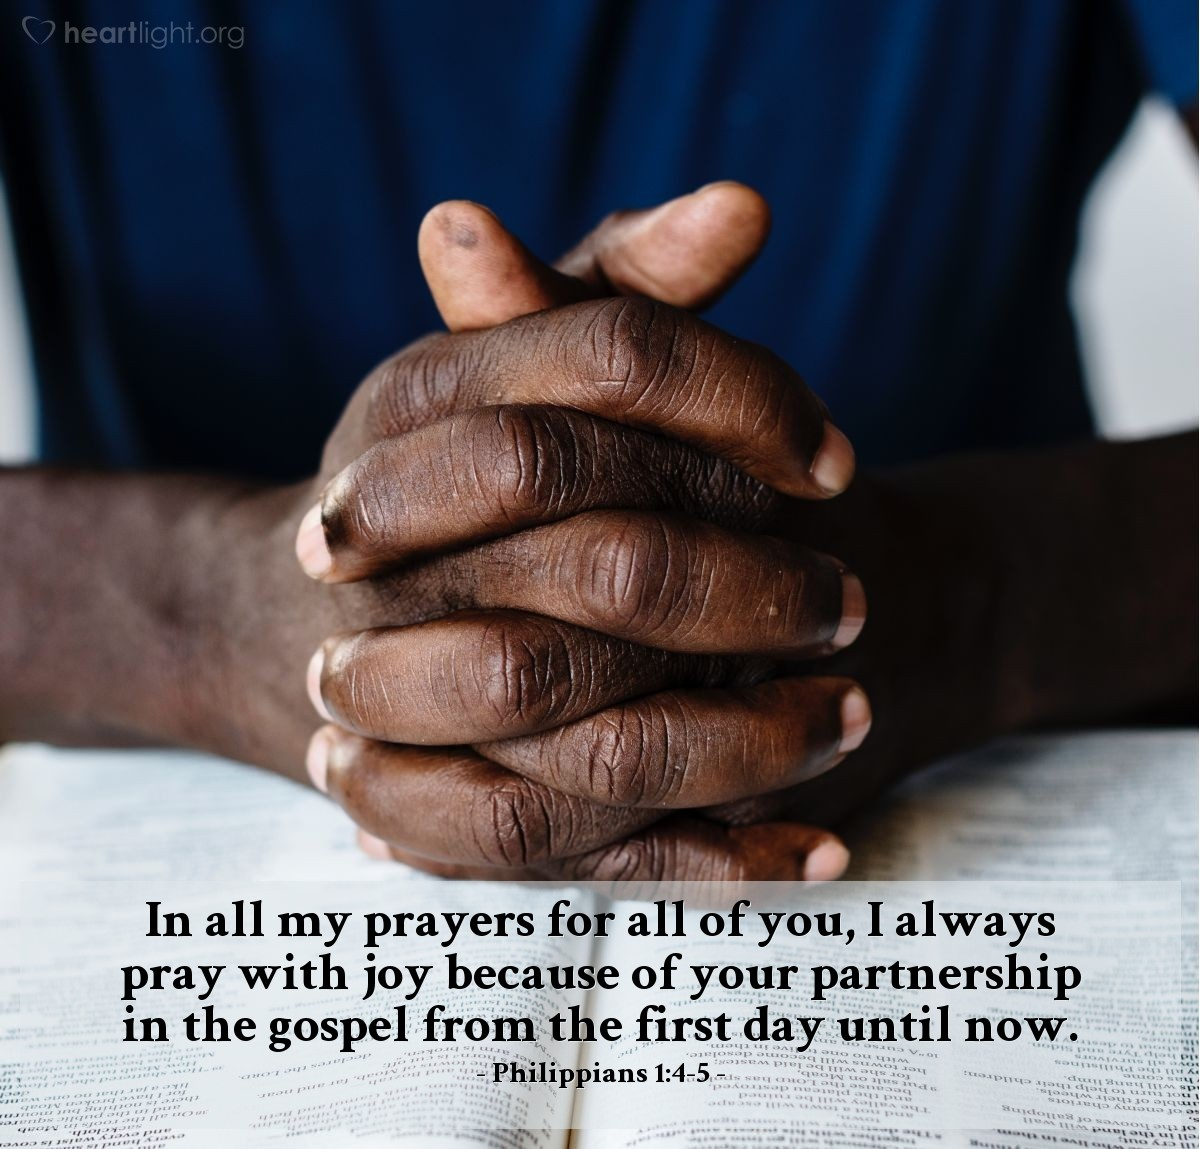 Inspirational illustration of Philippians 1:4-5